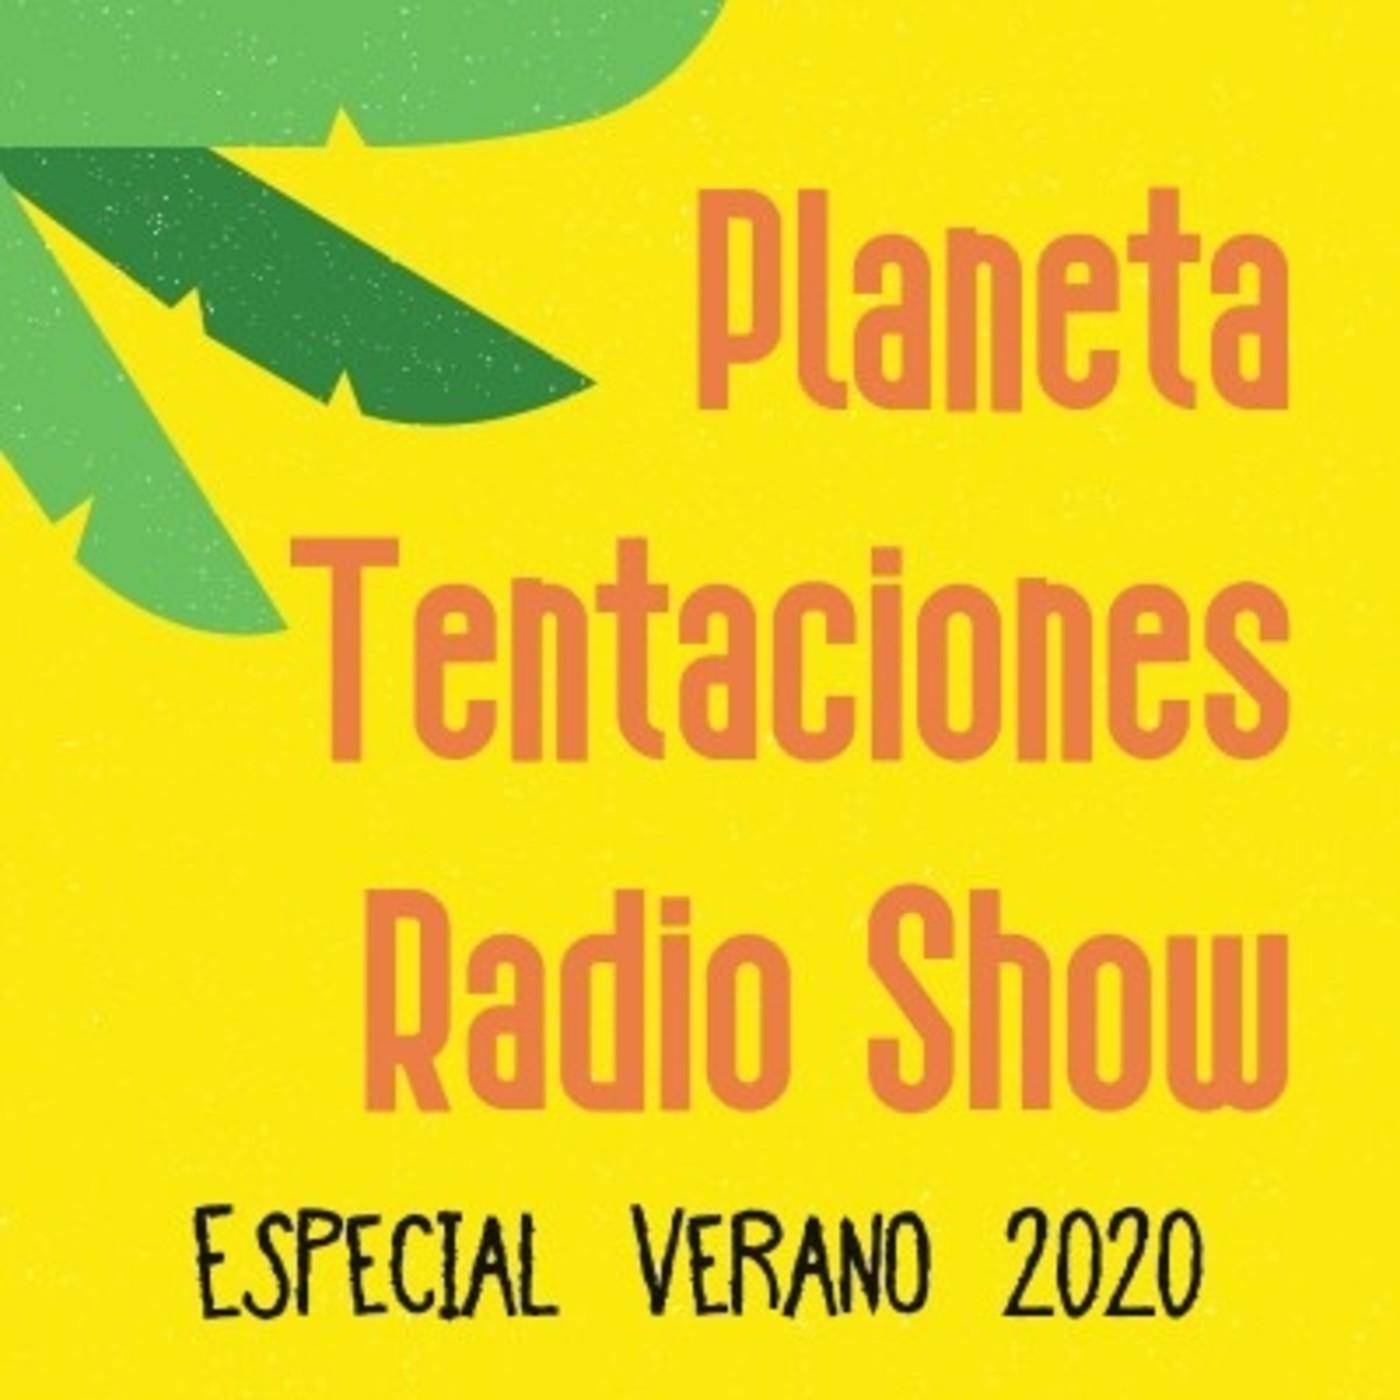 PTRS 19x54: Especial Verano 2020